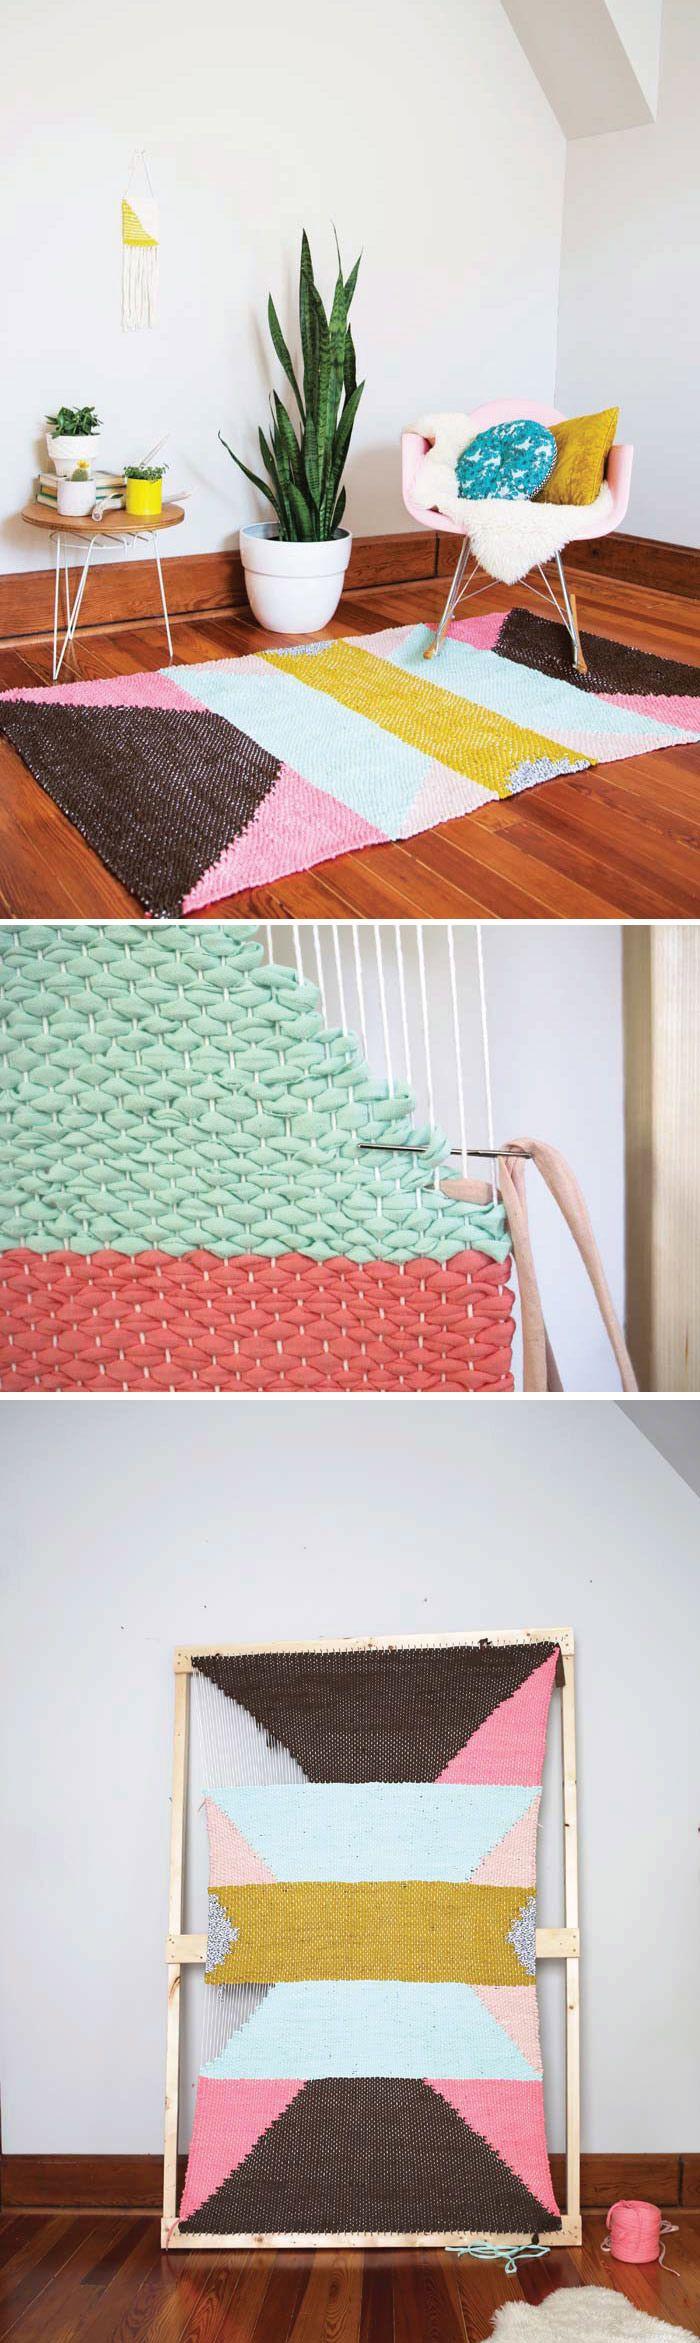 Fabric Rug Diy Weave A T Shirt Rug With Easy Diy Loom Rug Loom Fabric Rug And